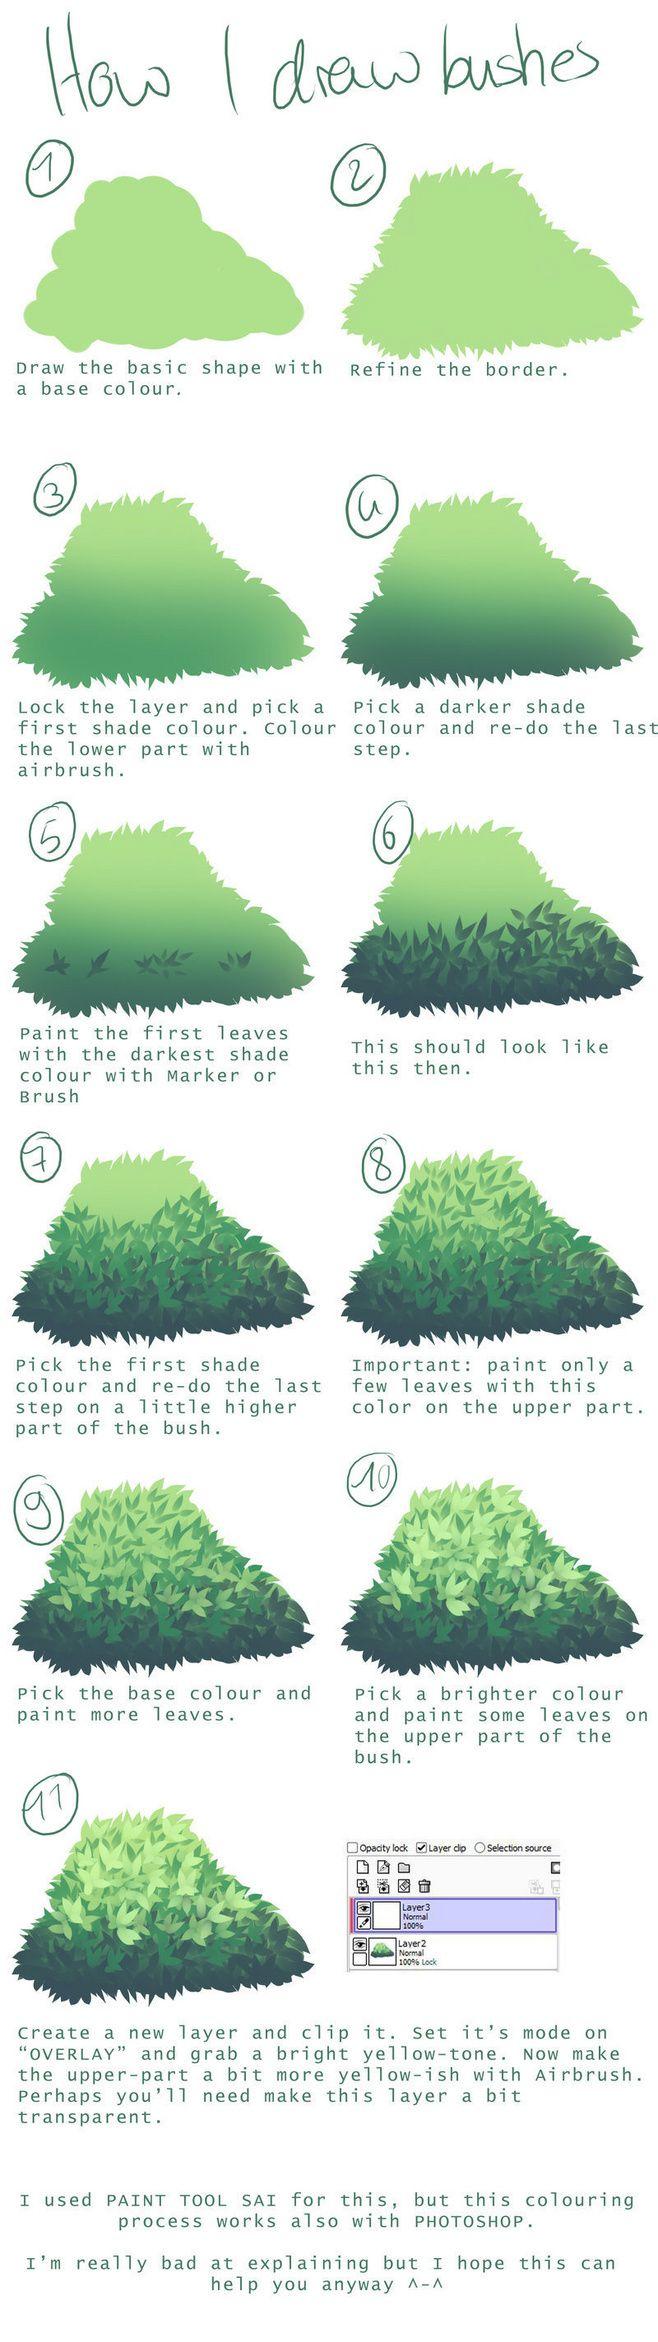 Arbustos, matorrales, árboles